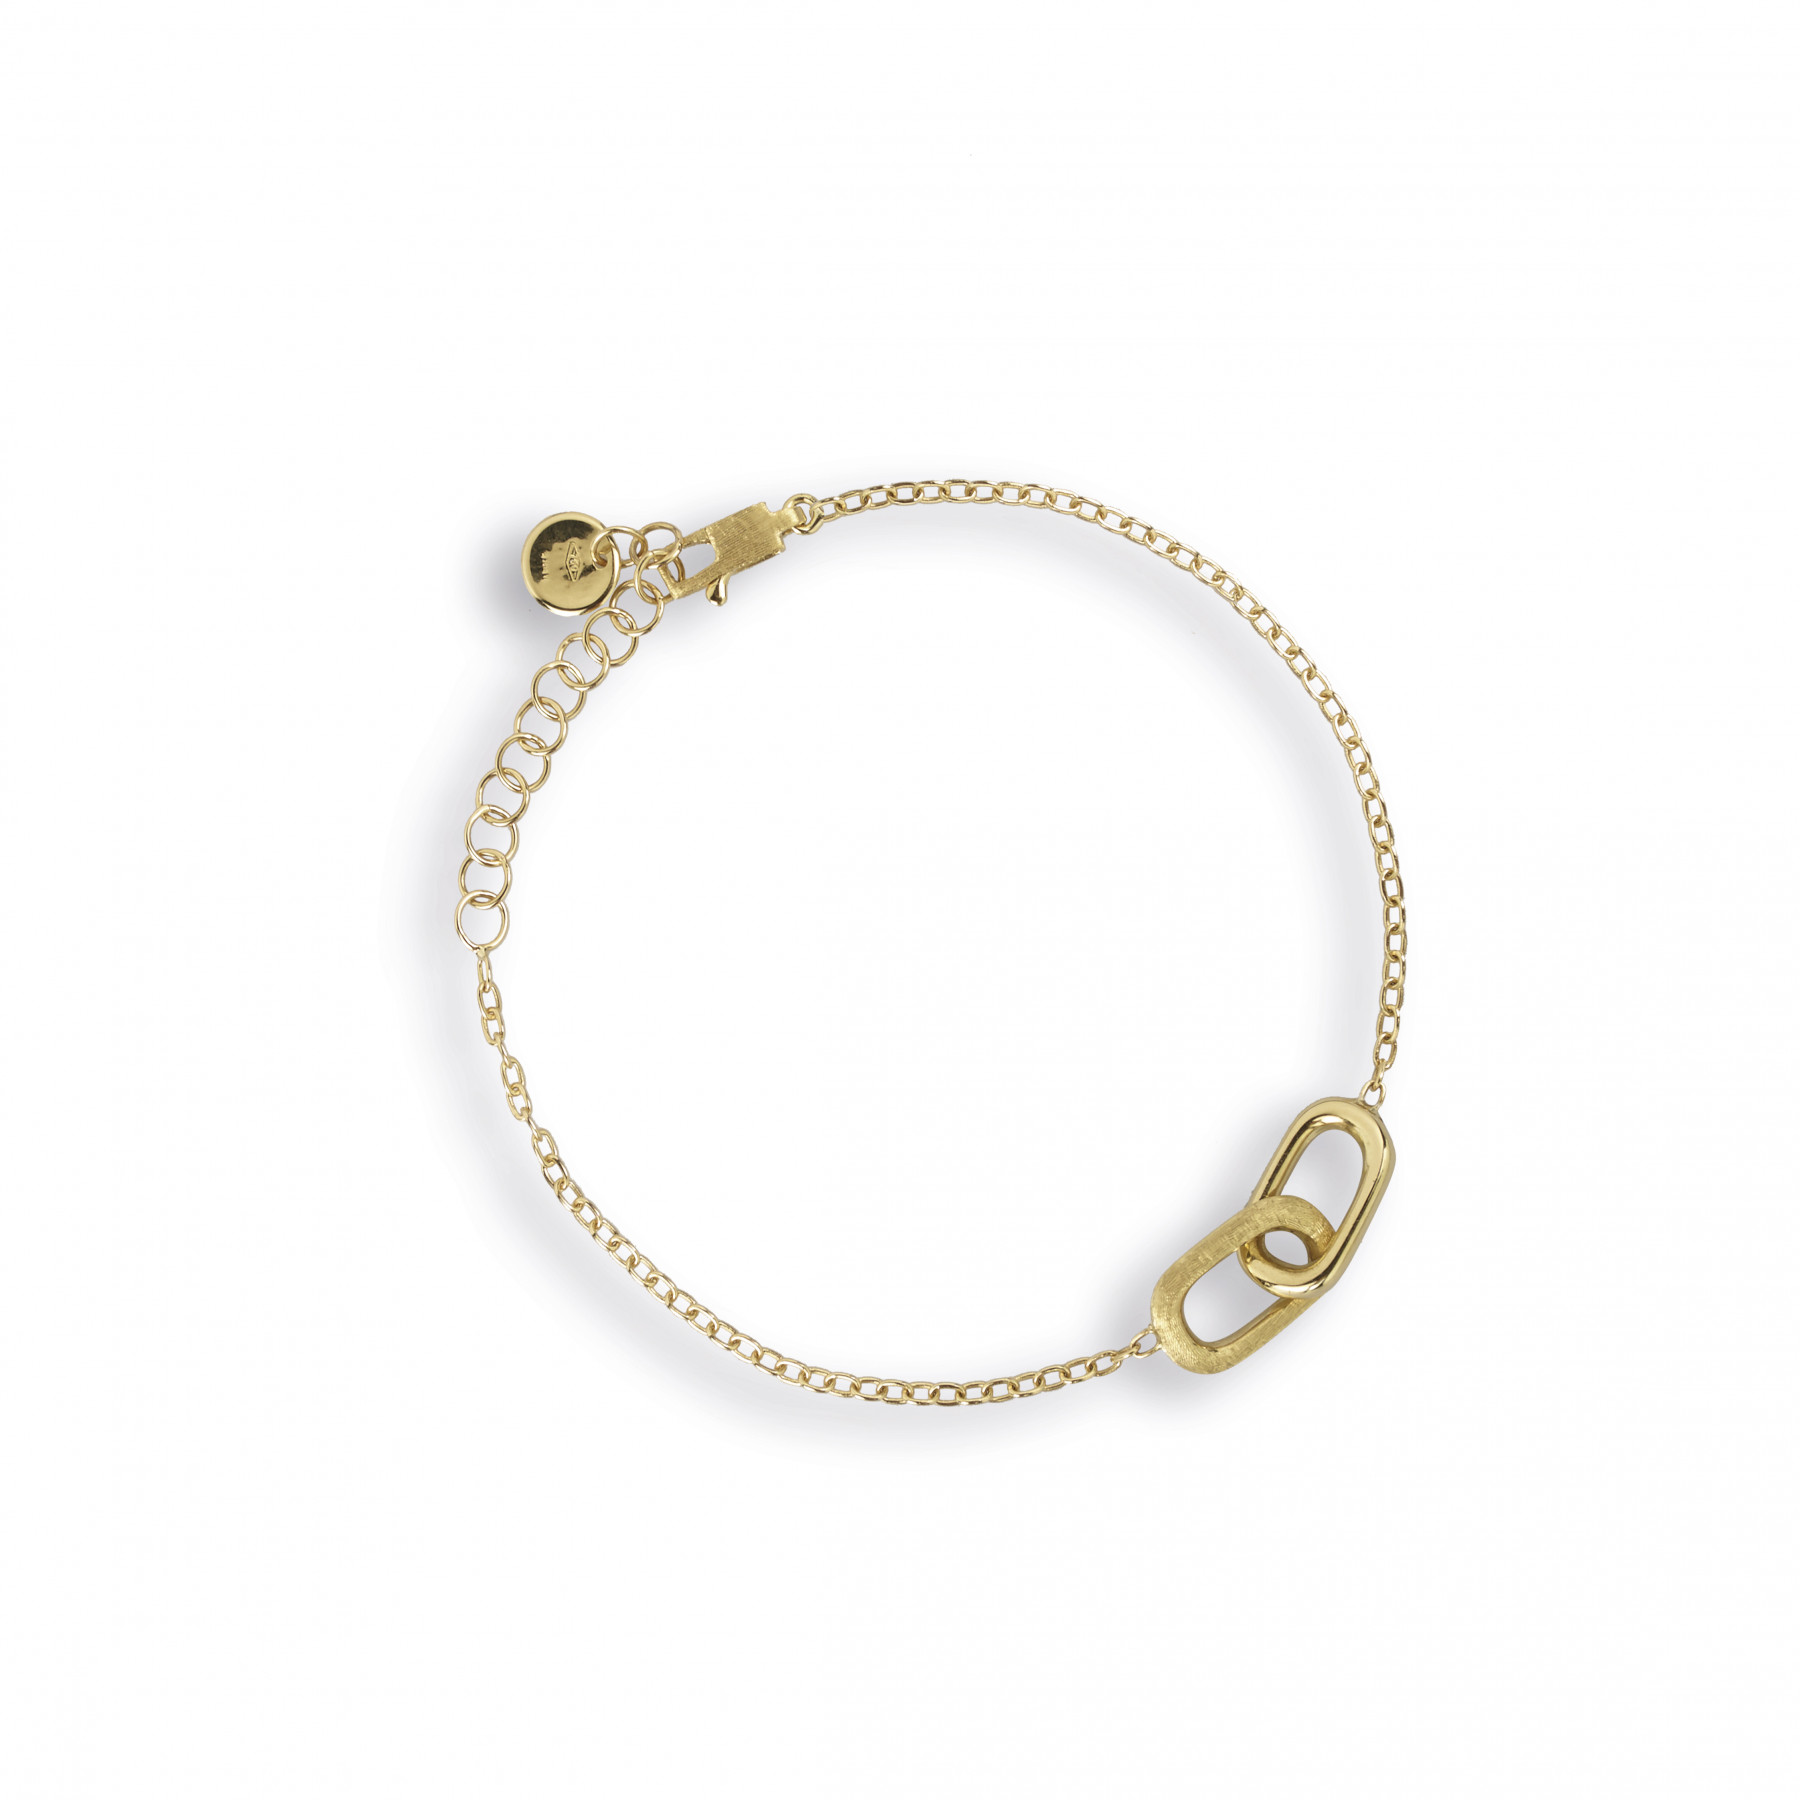 Marco Bicego Delicati Gold Station Bracelet